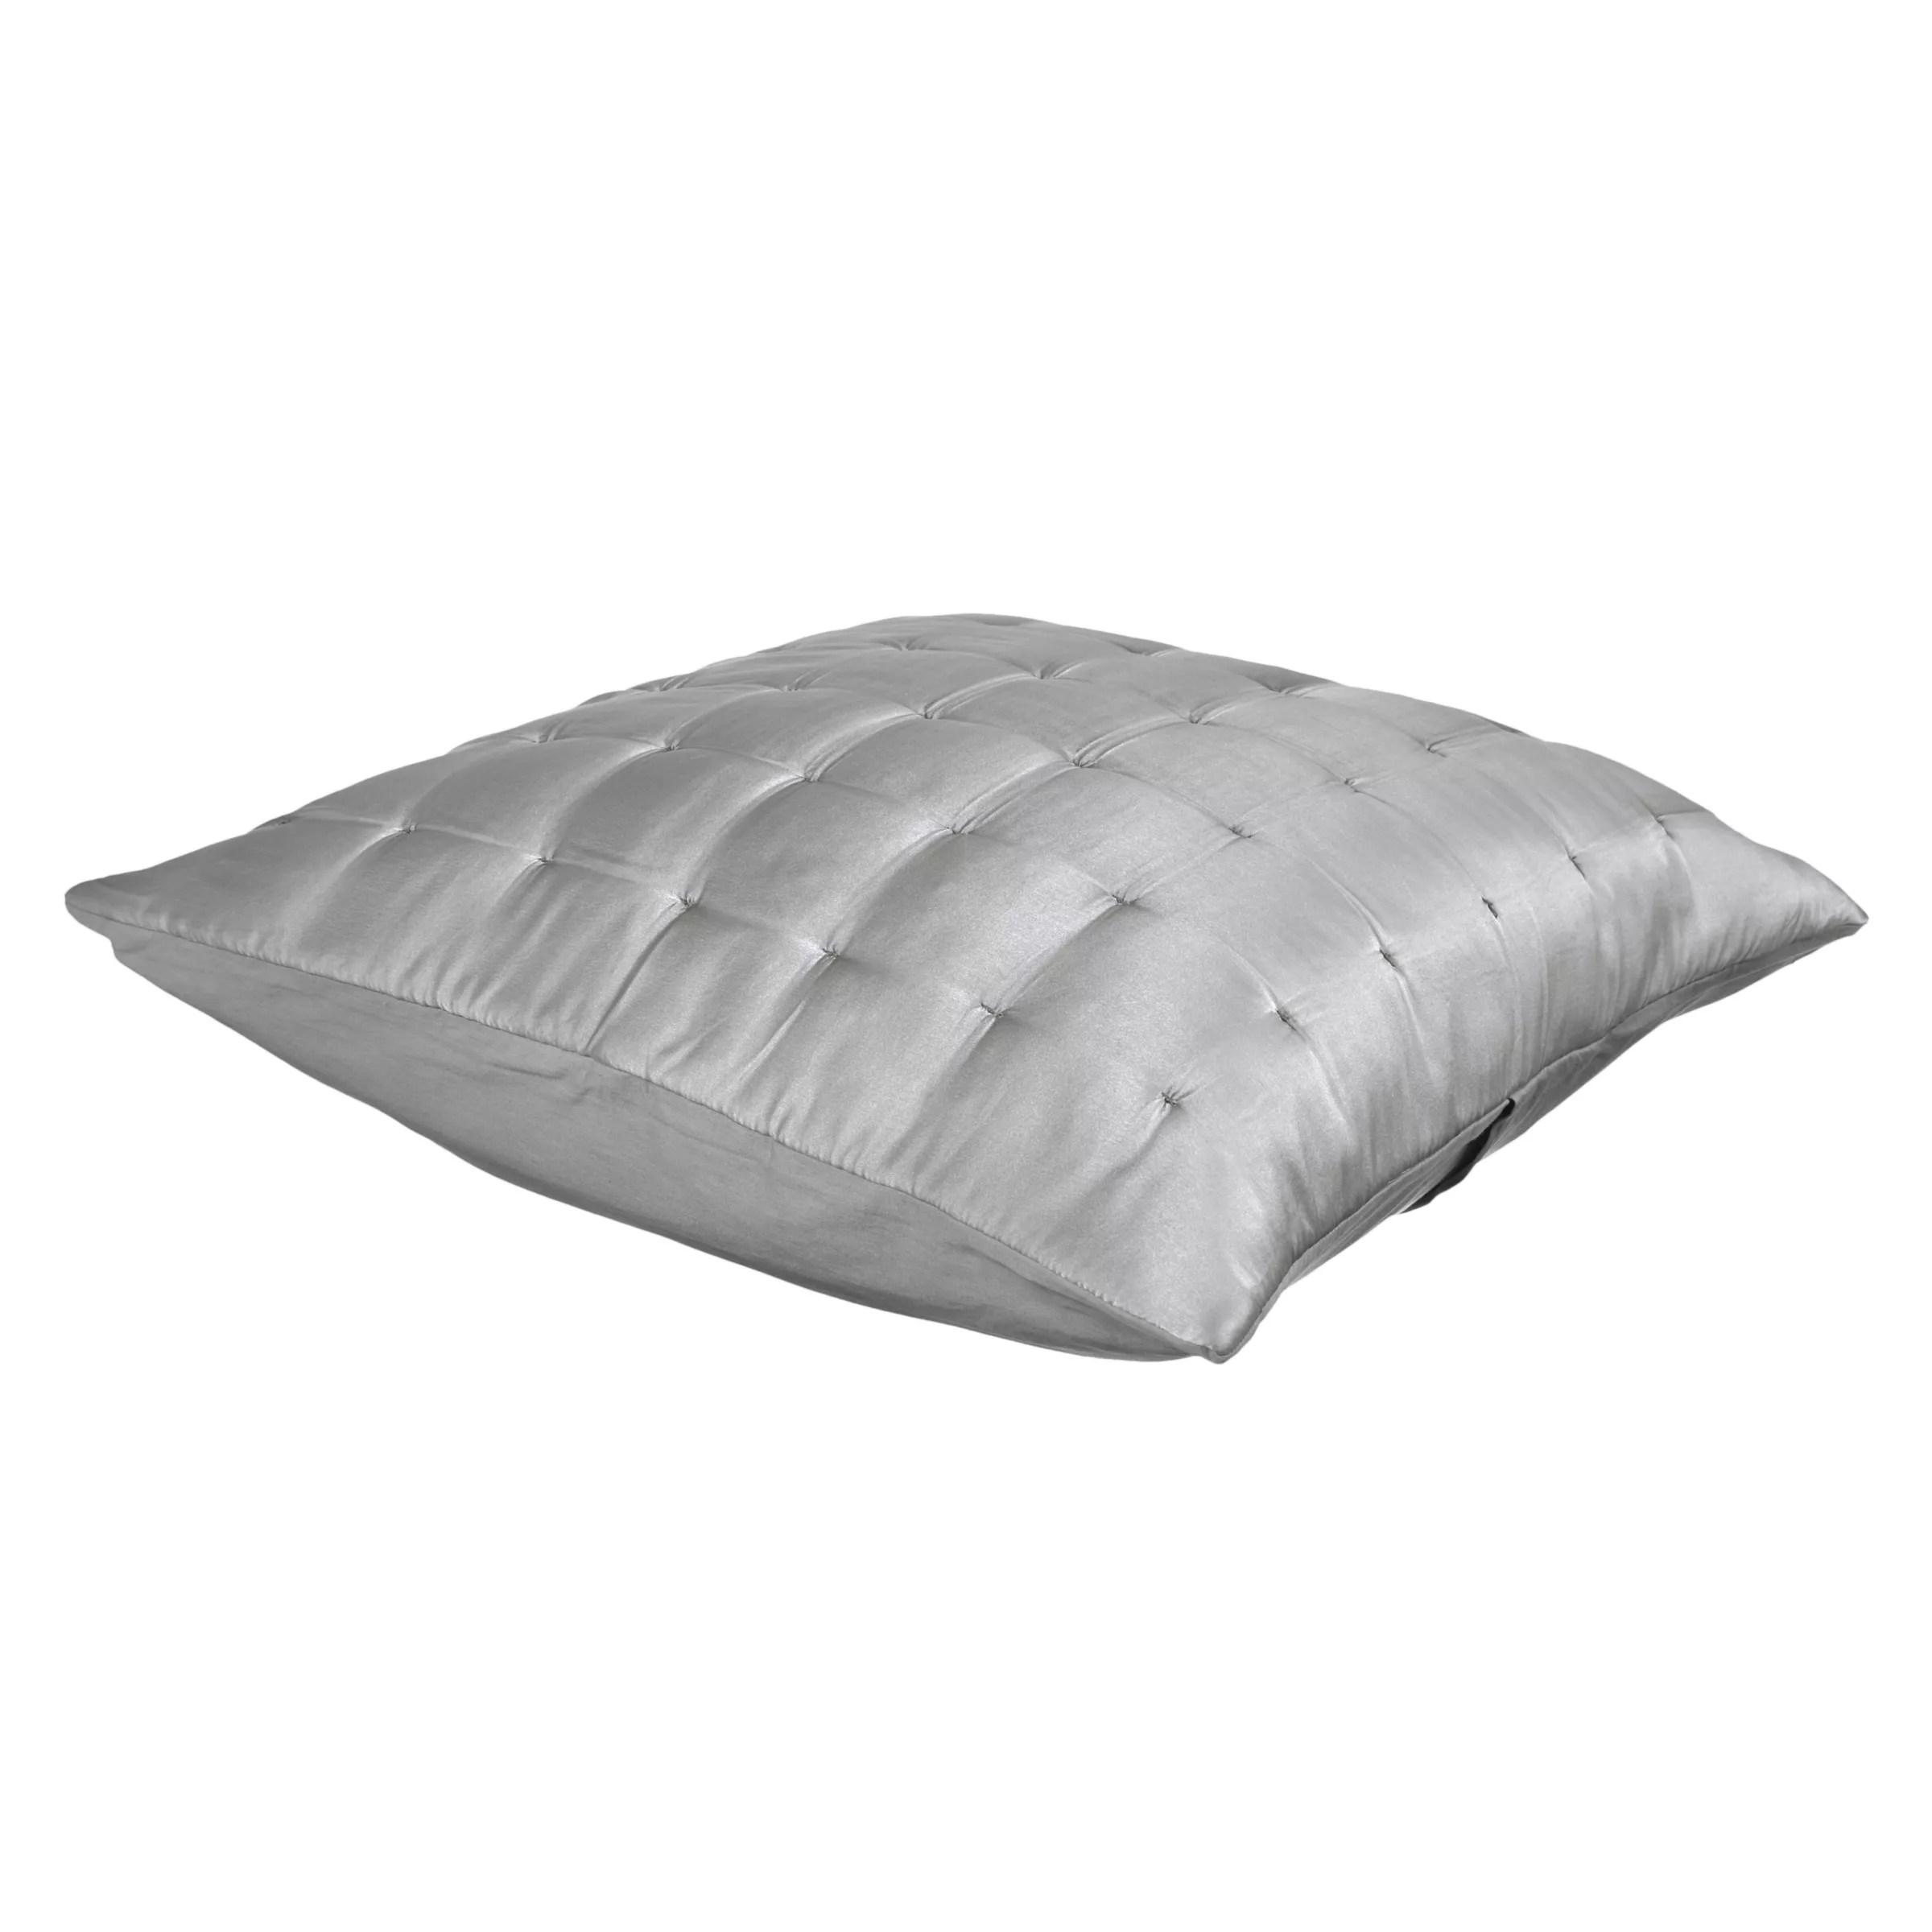 john lewis loose chair covers swivel aldi sofa cushion brokeasshome